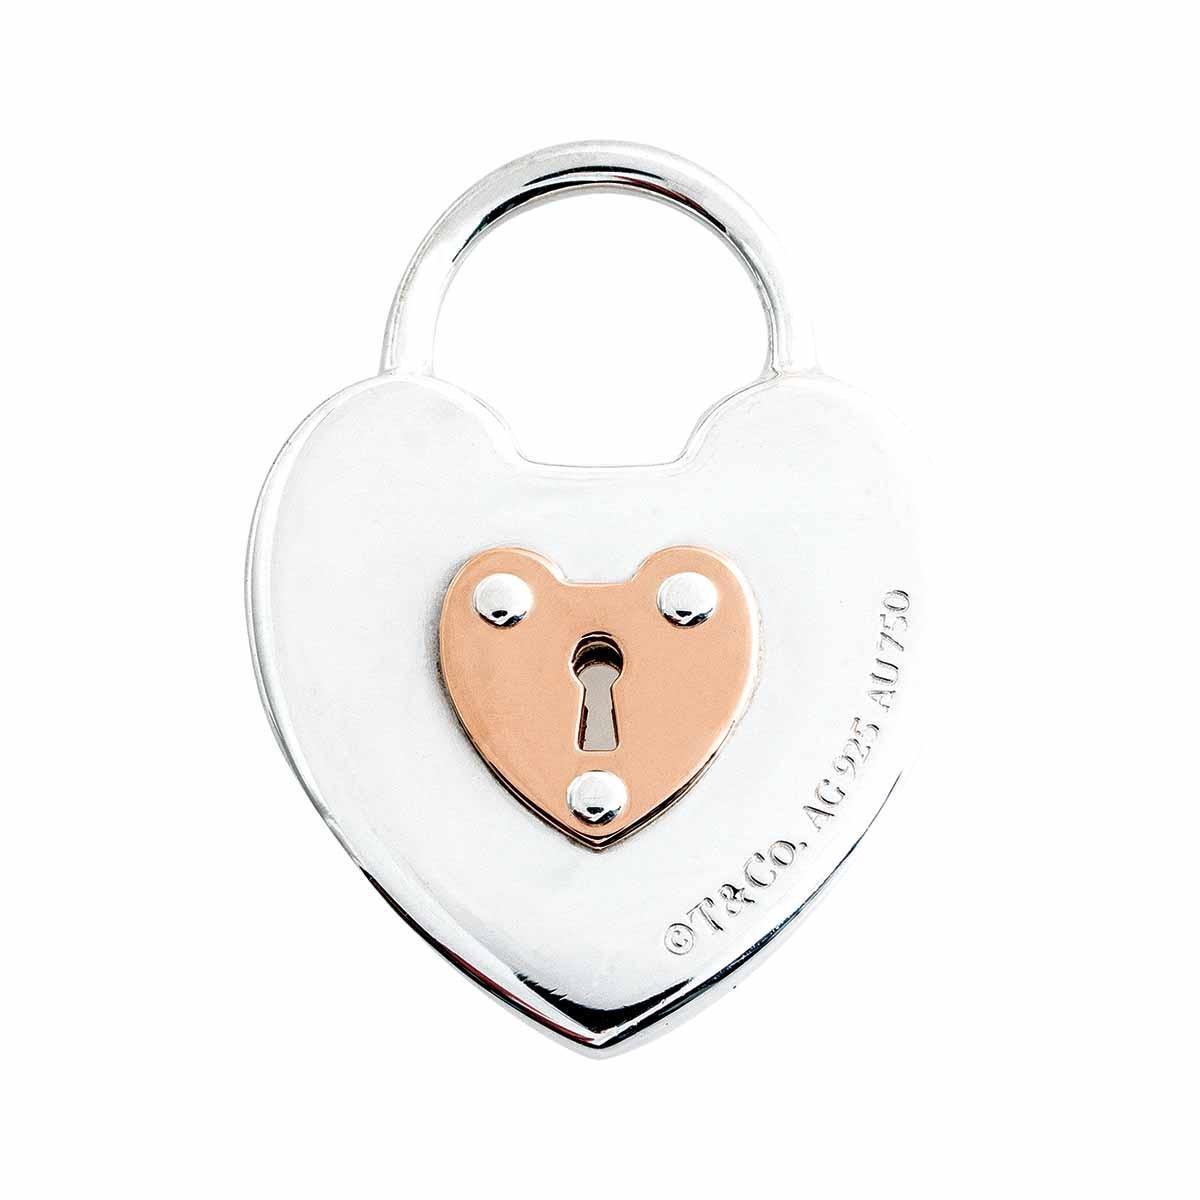 Vintage Tiffany & Co. Heart Key Lock Pendant